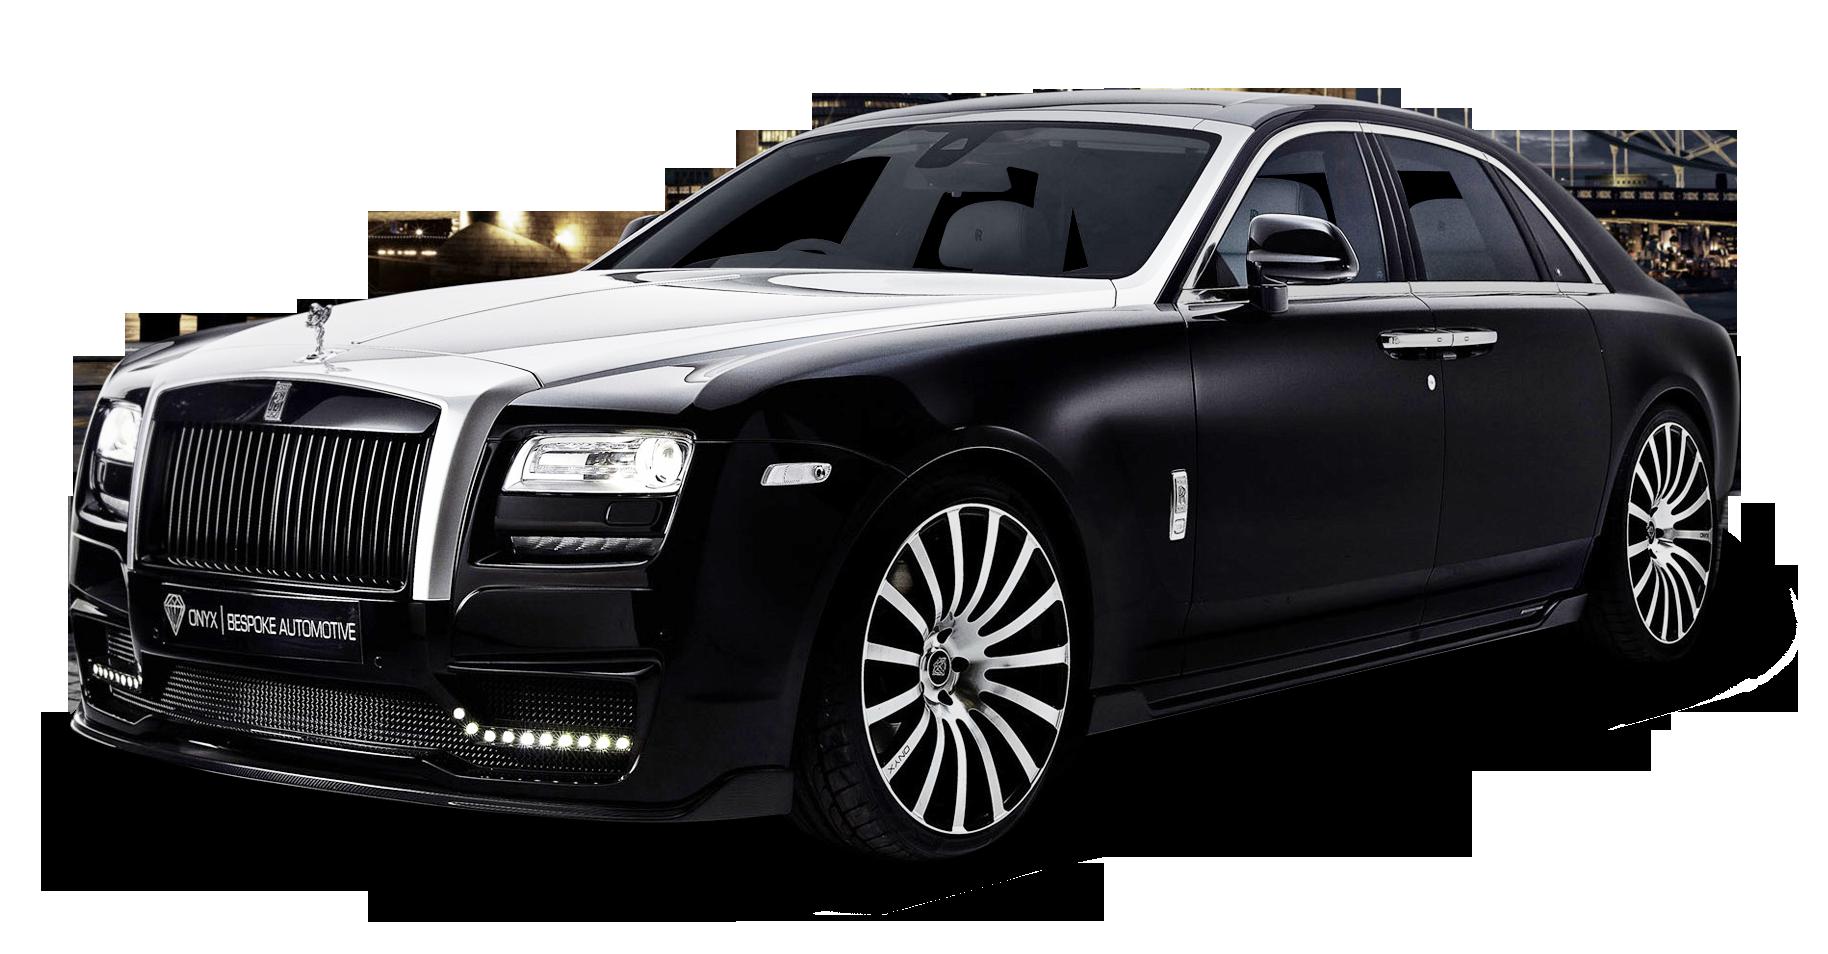 Rolls Royce Ghost Black Car Png Image Rolls Royce Ghost Black Rolls Royce Black Black Car